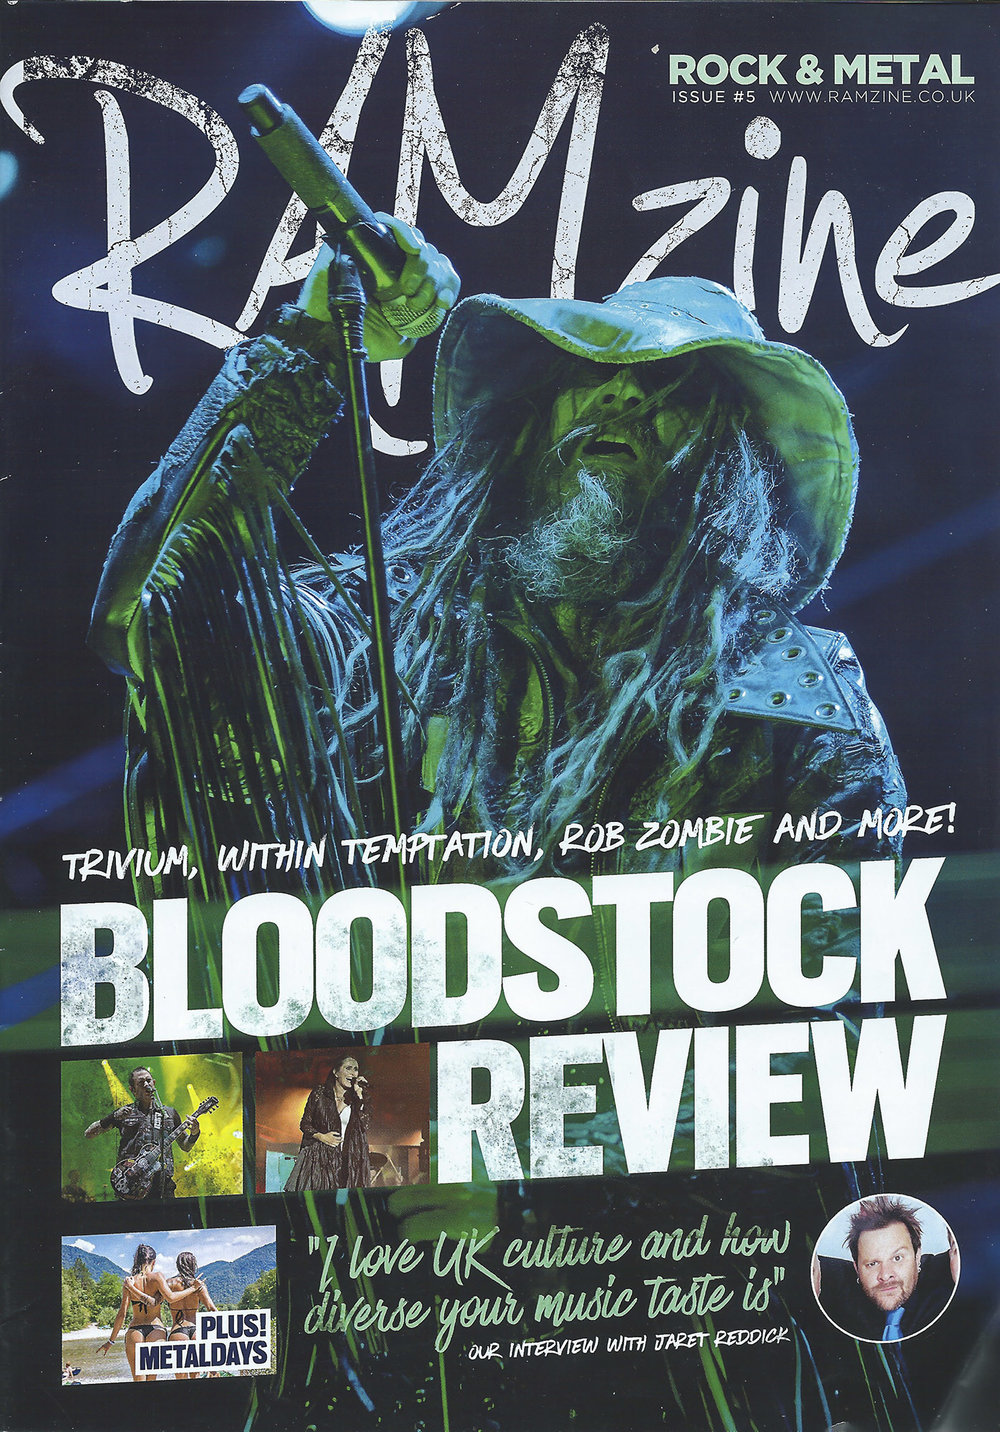 Ramzine Rock and Metal Magazine - Cover Shot